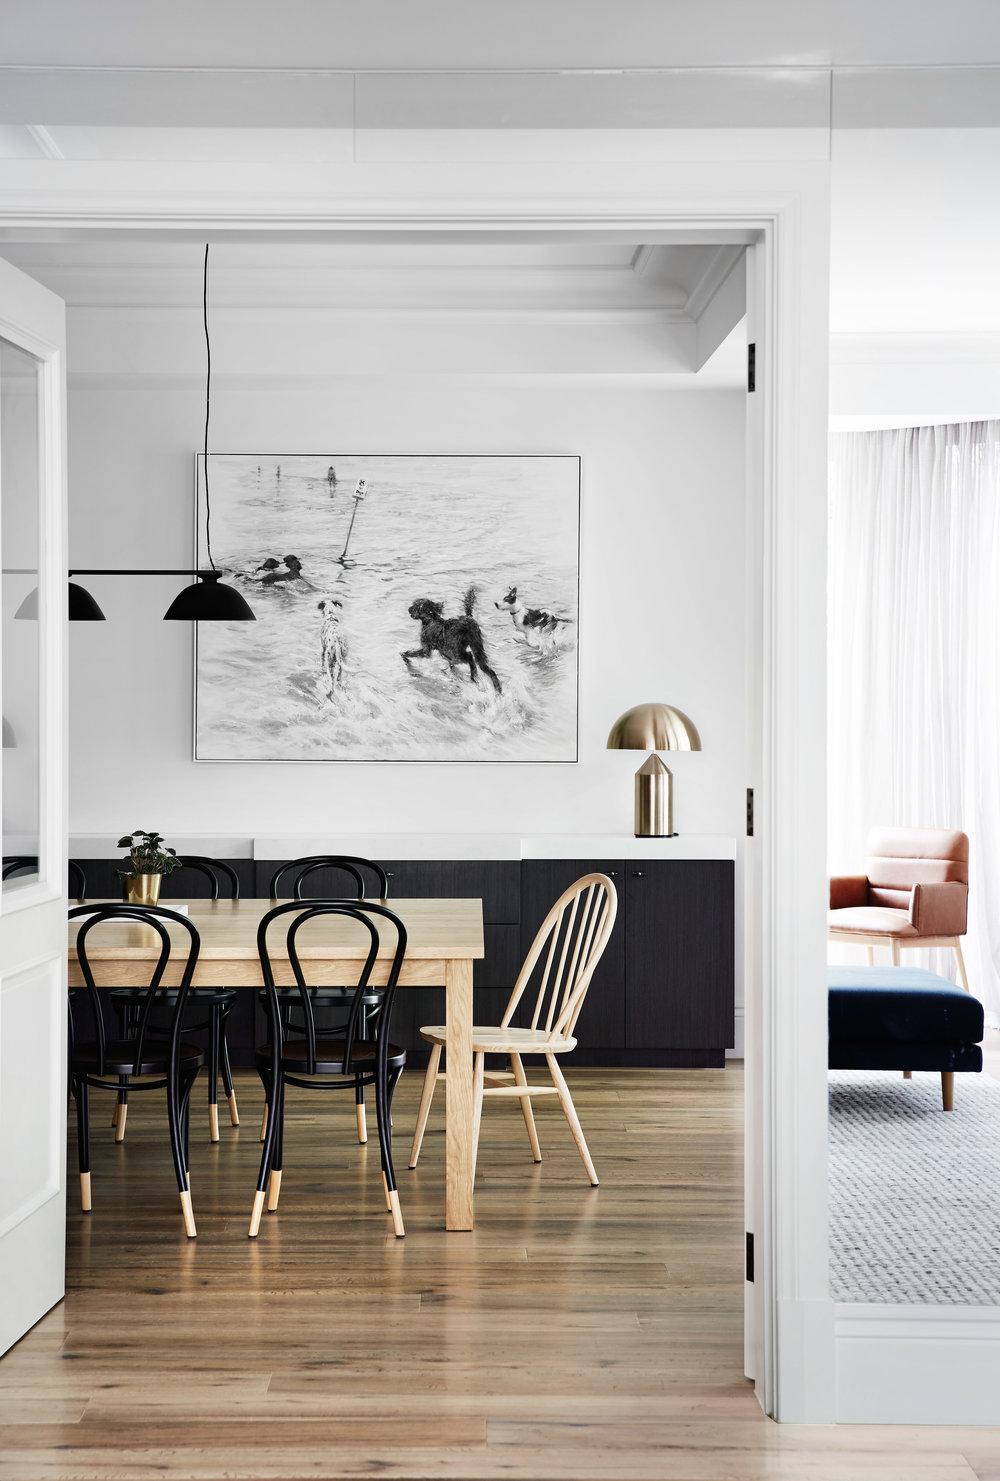 Studio Griffiths_Toorak Apartment 3_Photo credit ©Sharyn Cairns_01.jpg